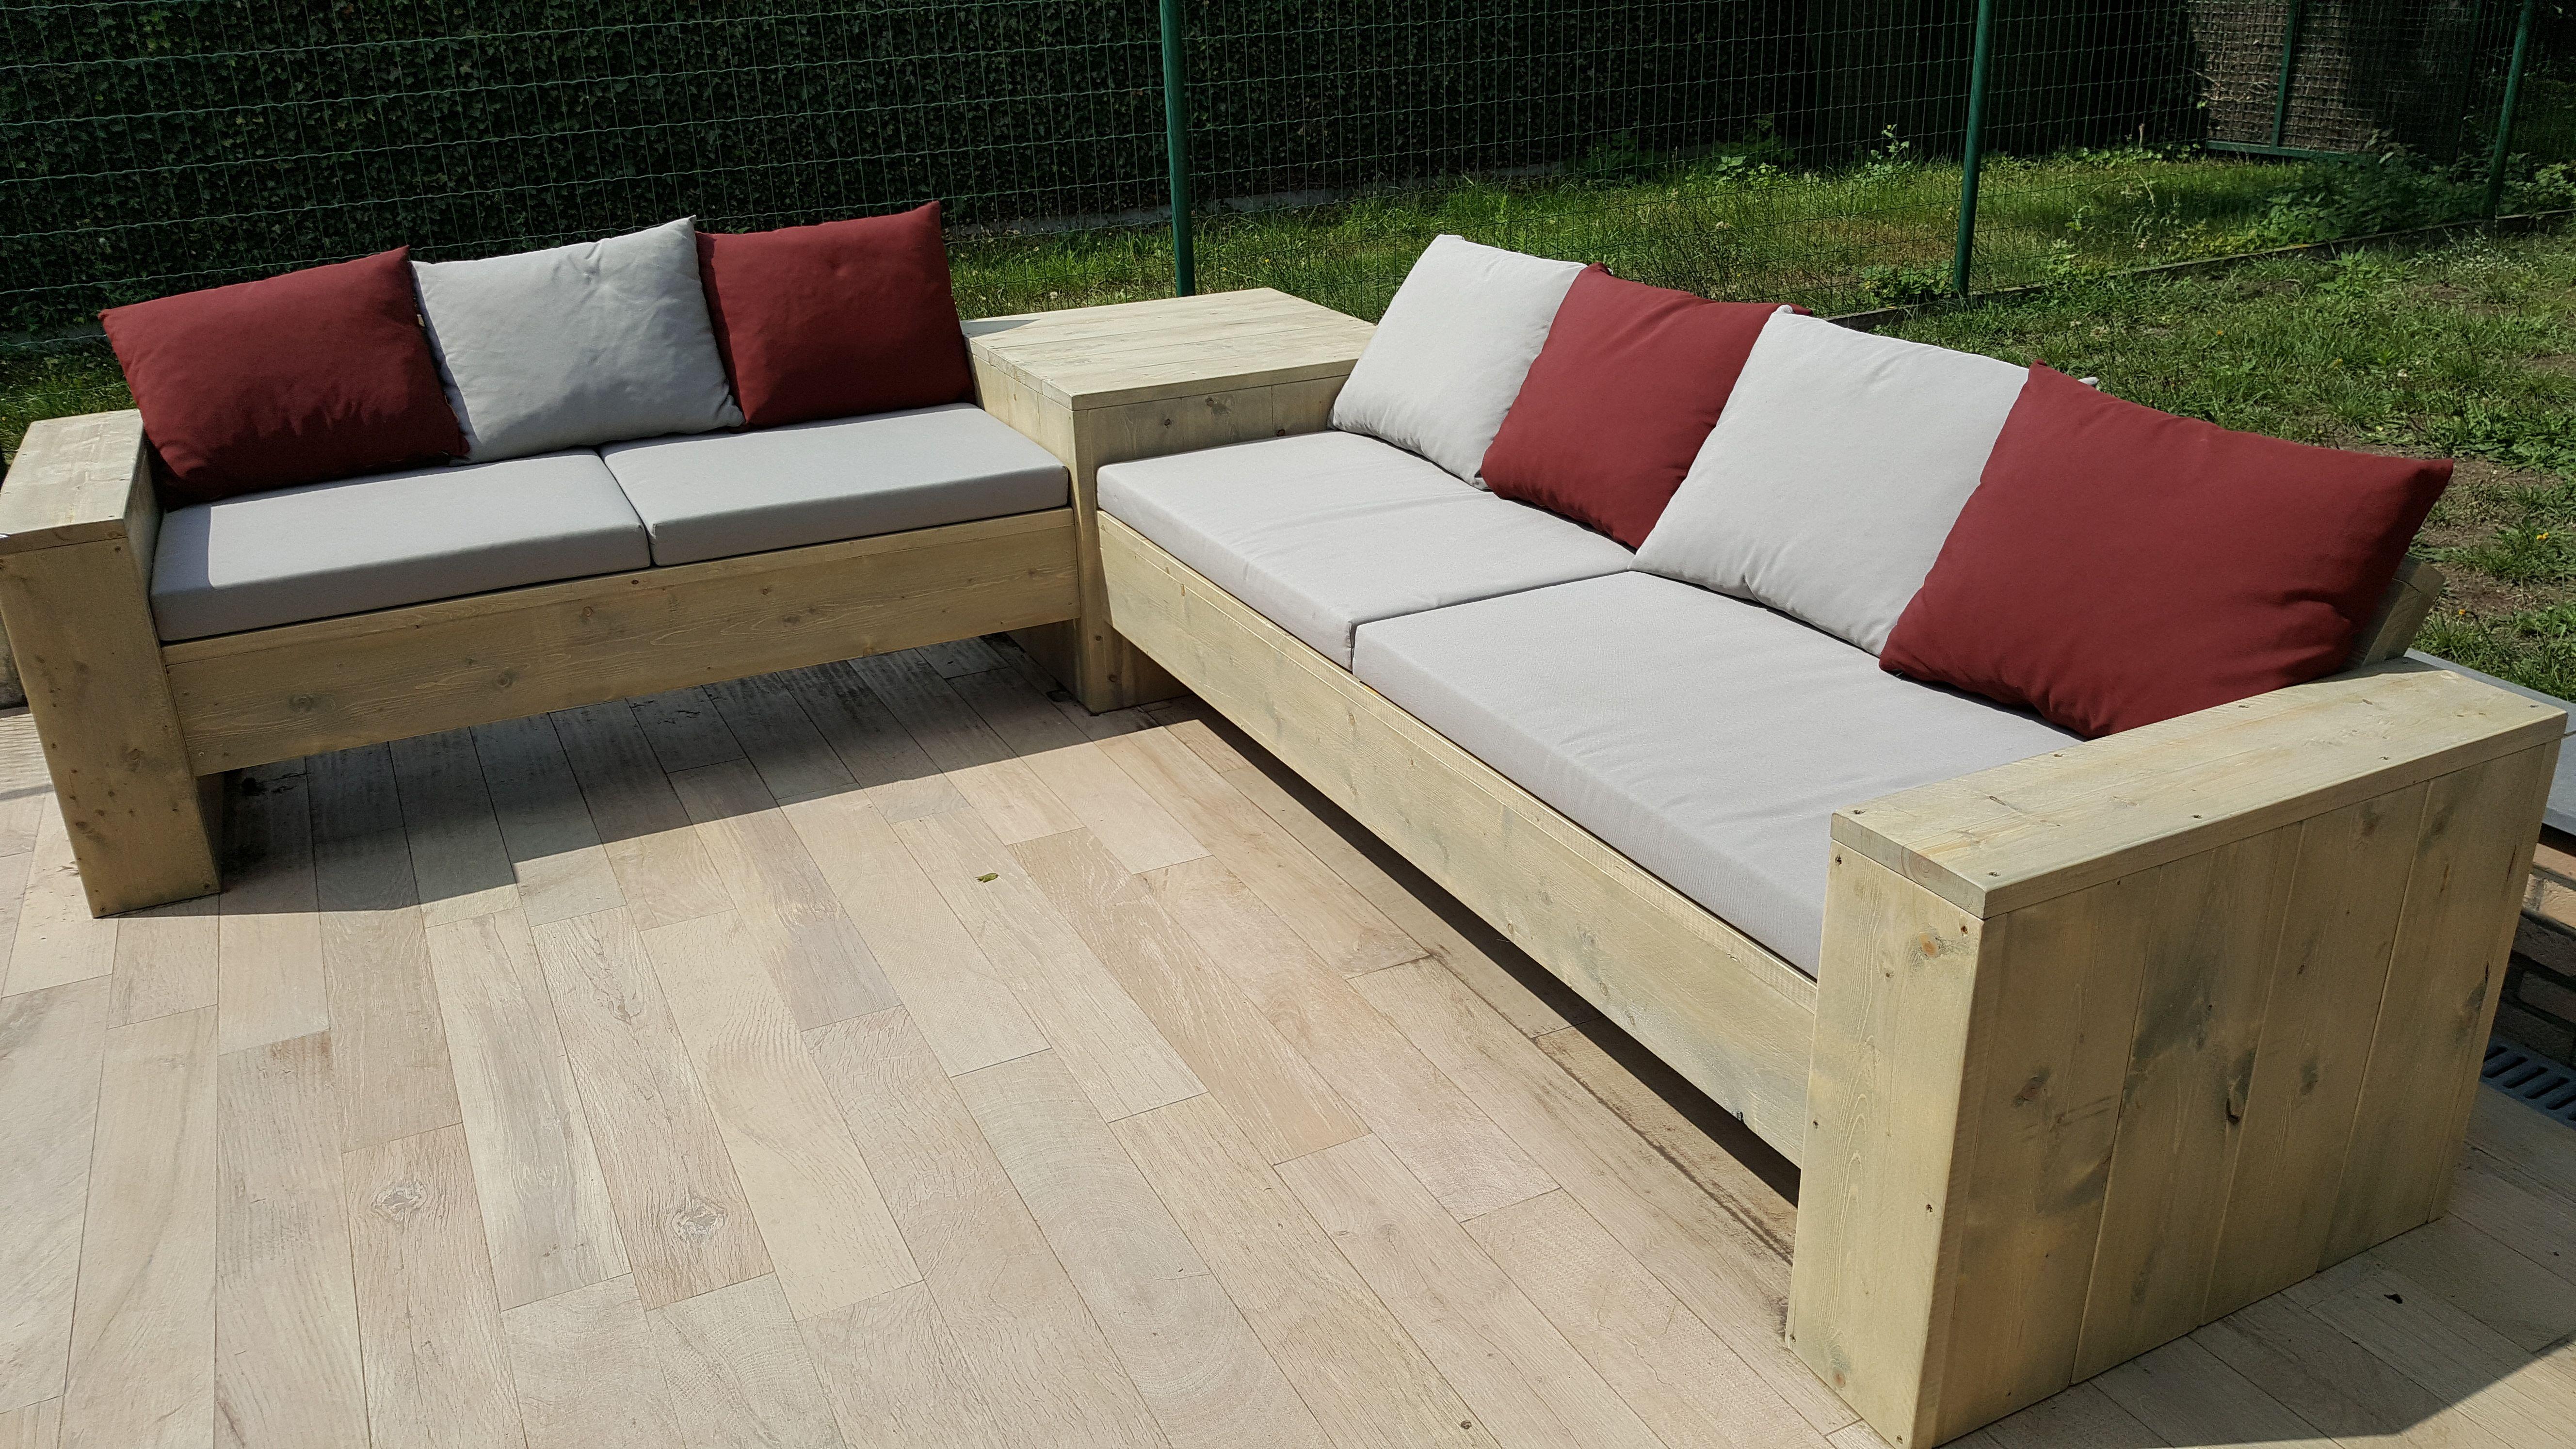 Kussens Loungebank Steigerhout : ≥ loungefauteuil van steigerhout met kussens tuinmeubelen